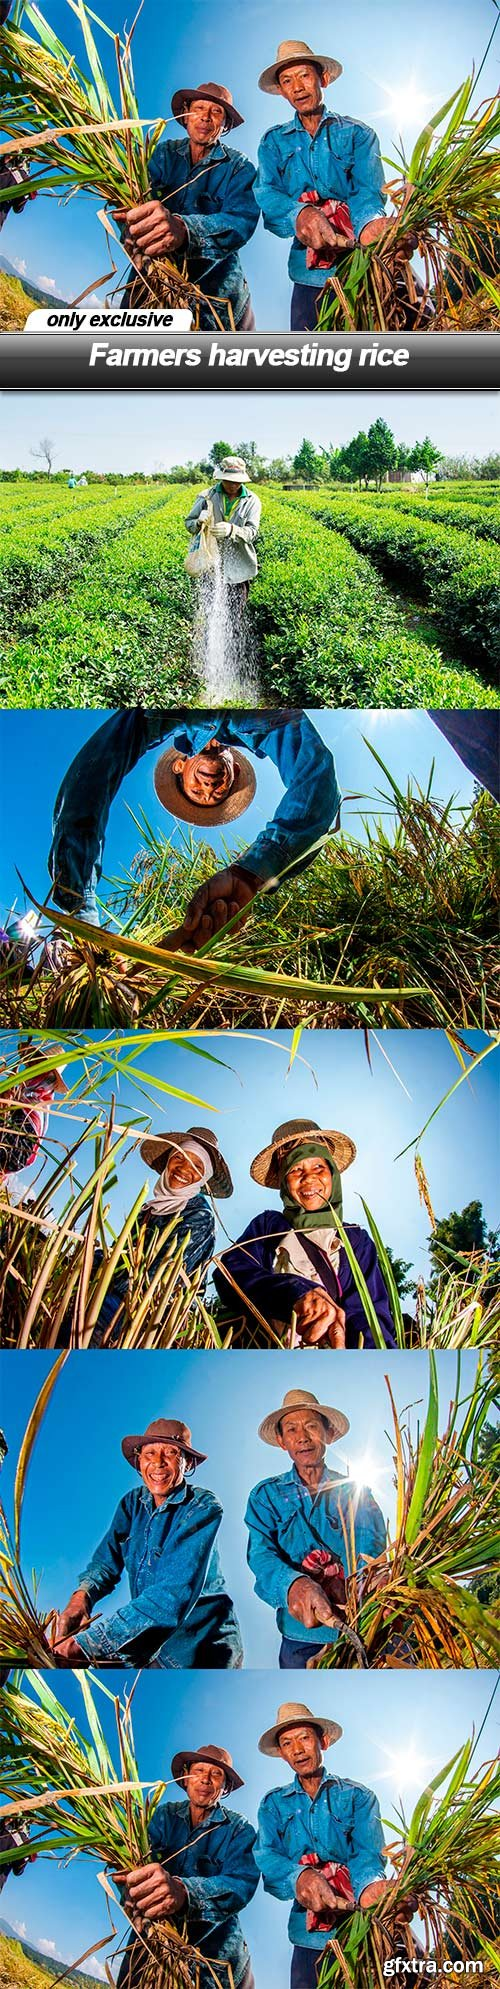 Farmers harvesting rice - 5 UHQ JPEG